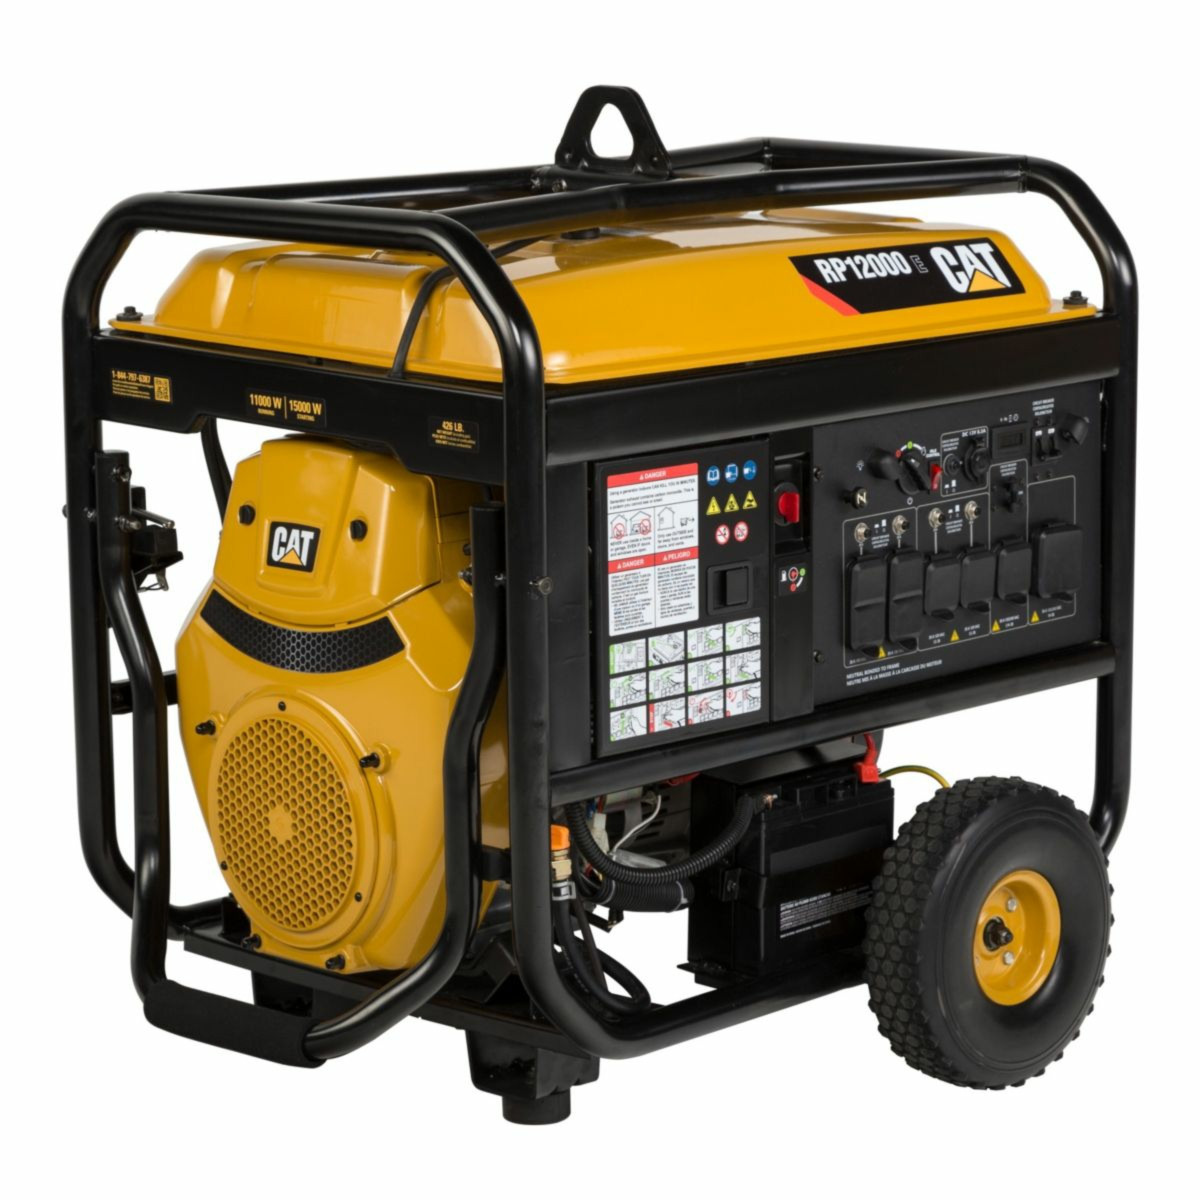 medium resolution of caterpillar rp12000e 12000w electric start portable generator free shipping